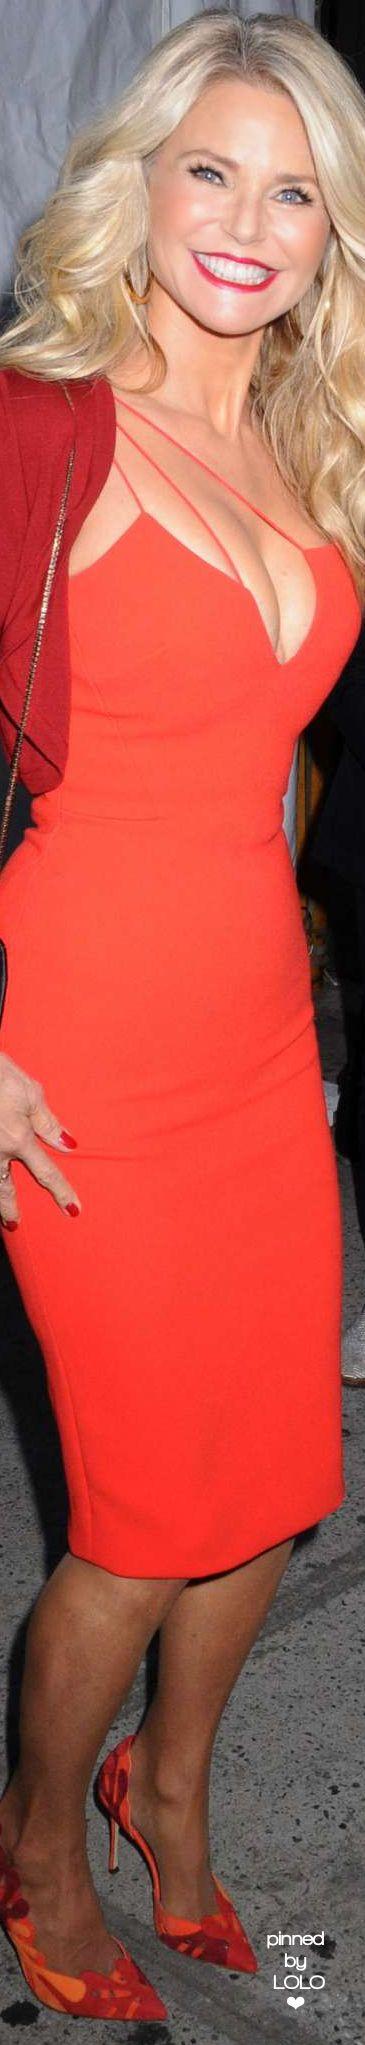 Christie Brinkley    LOLO❤︎